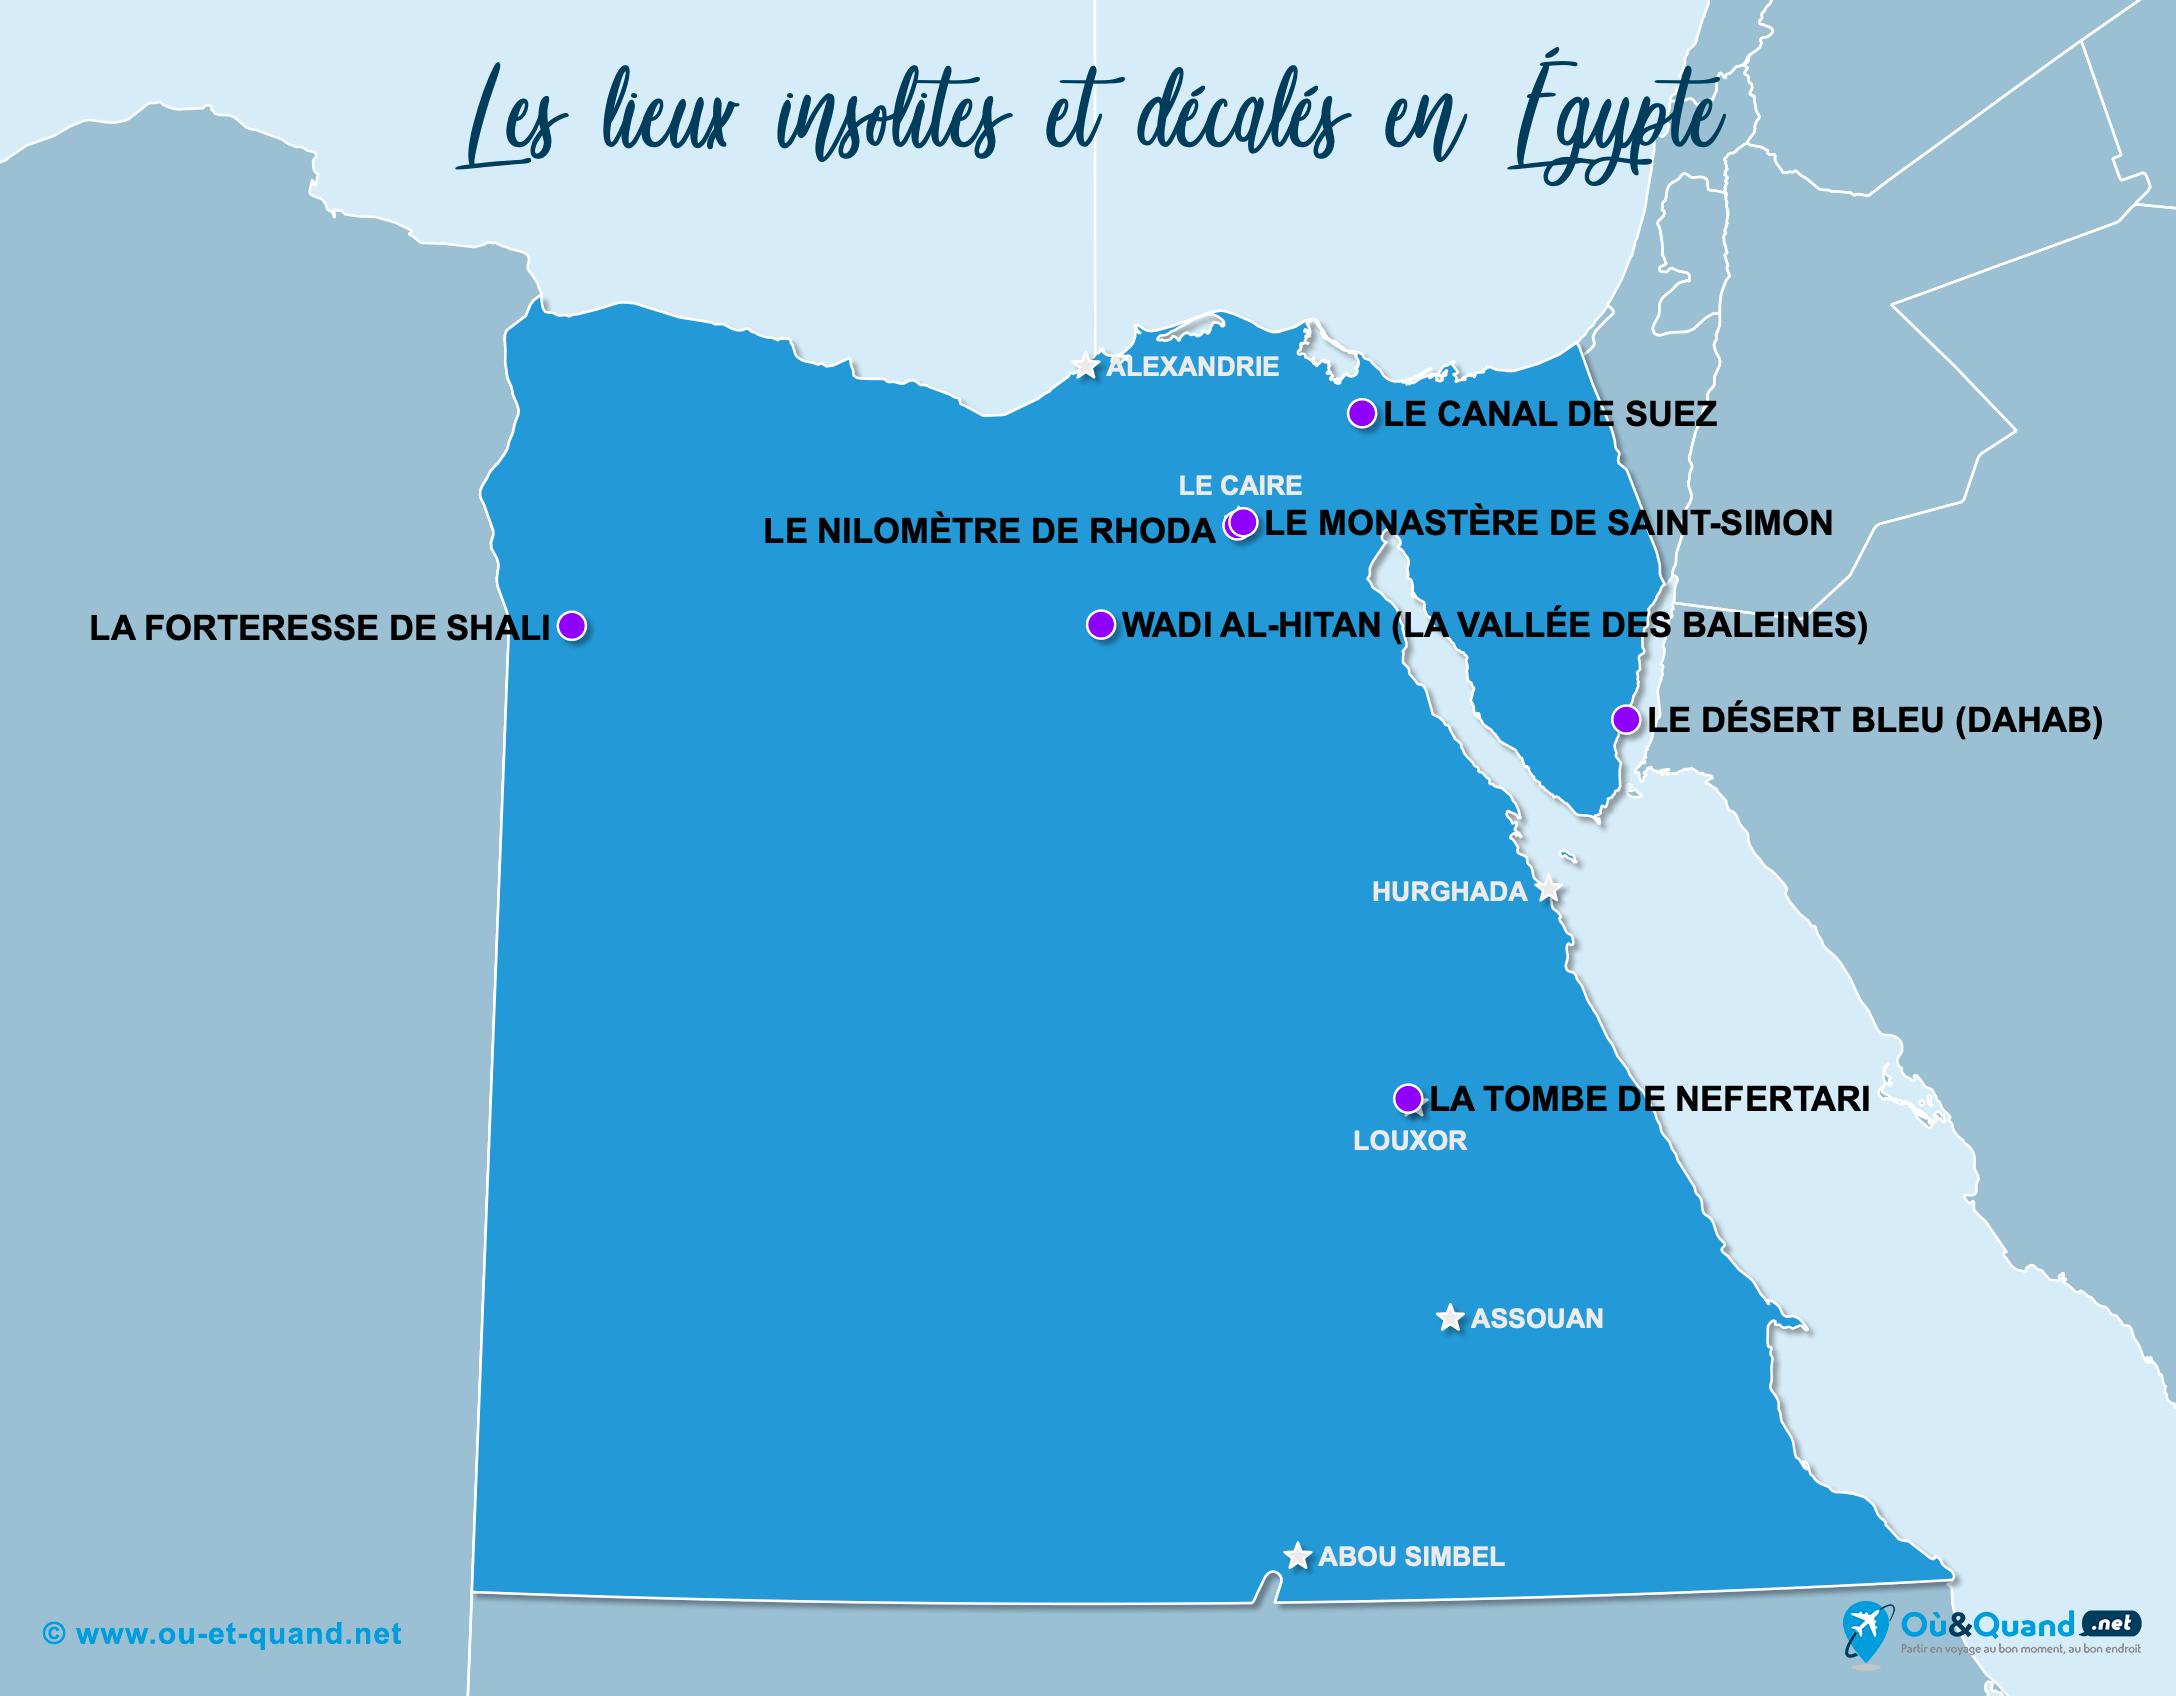 Carte Égypte : L'Égypte insolite